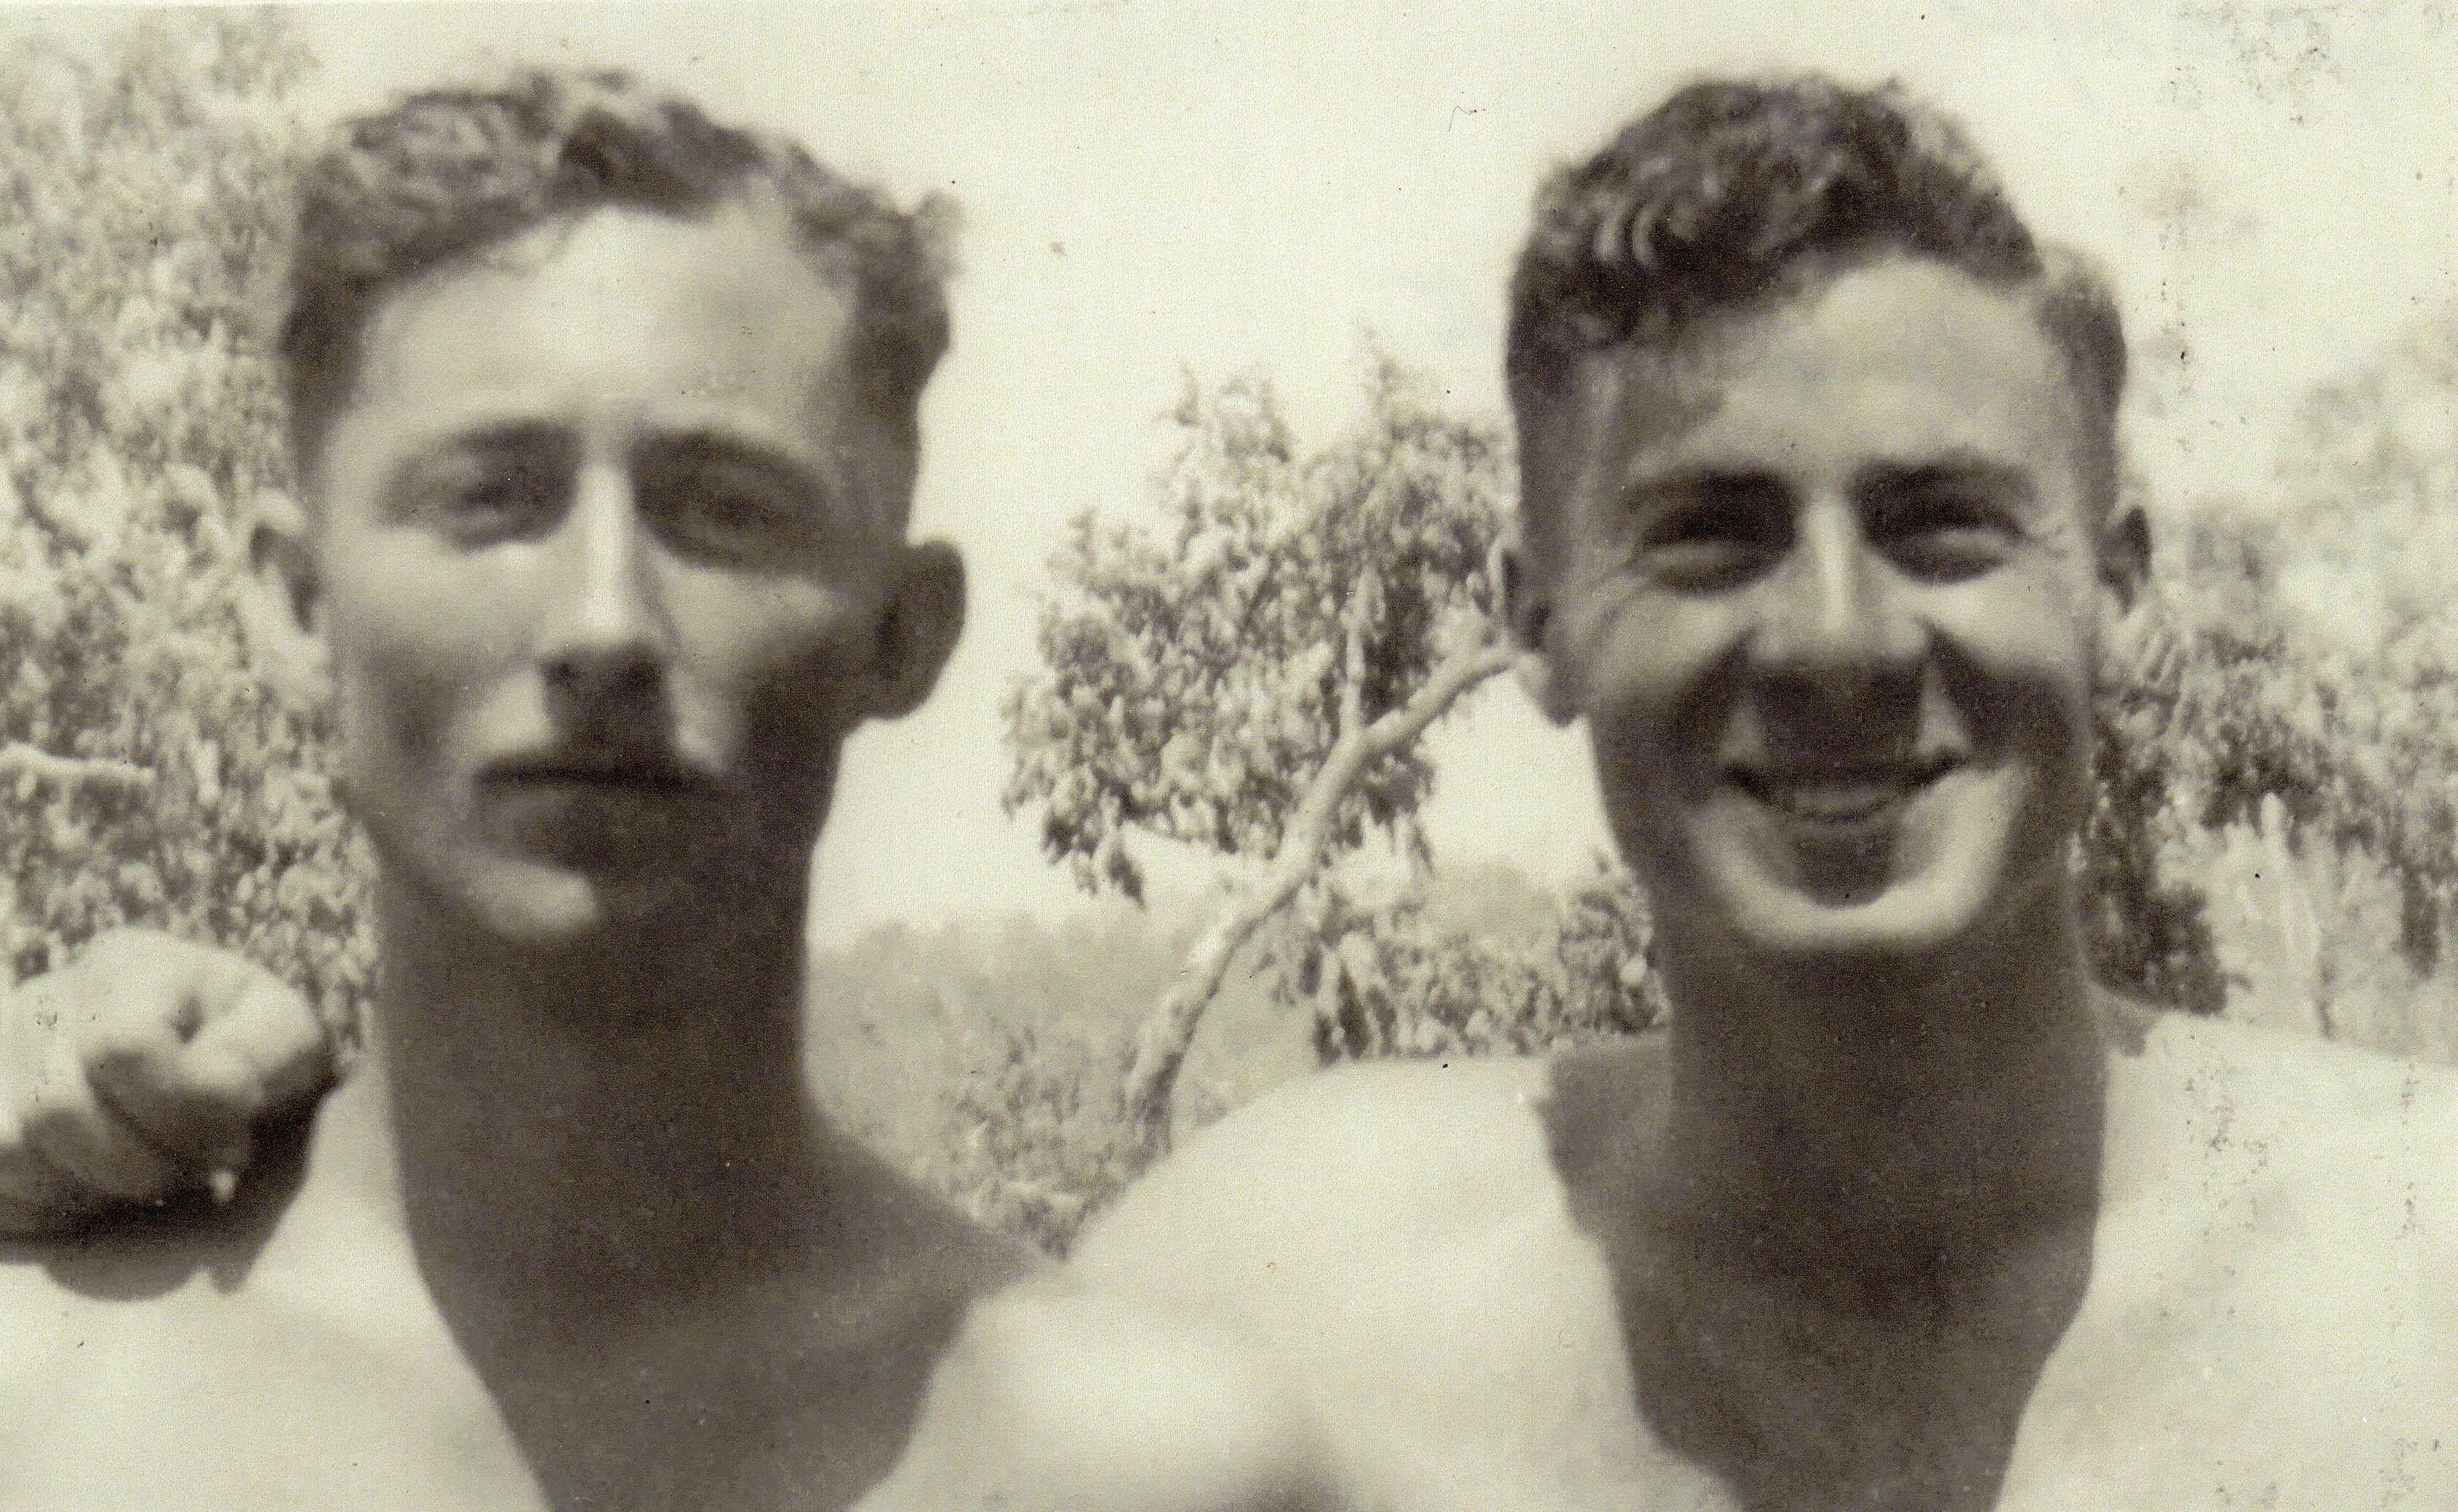 Smith and Kerrigan